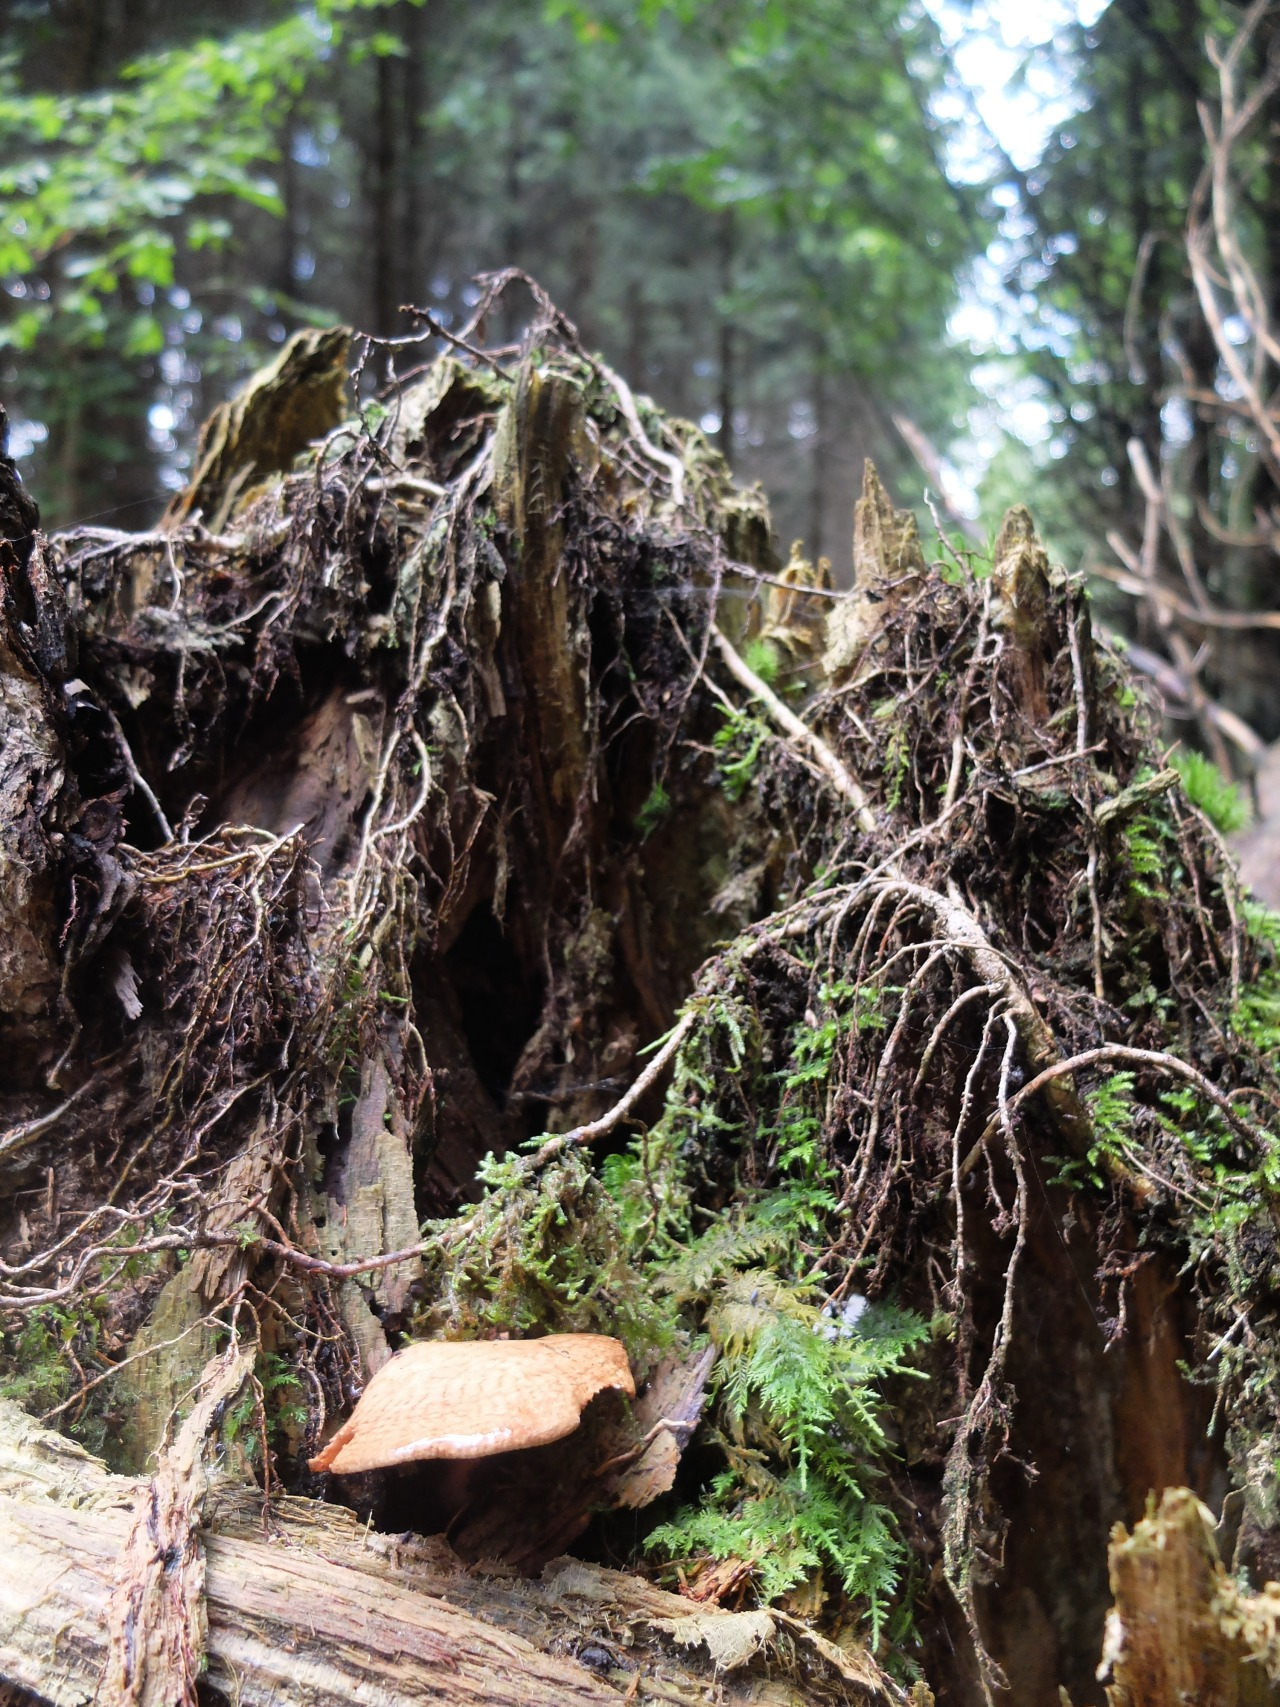 mangia minga // 'In den Schwammerln: foraging mushrooms in the Kruezlinger forest'